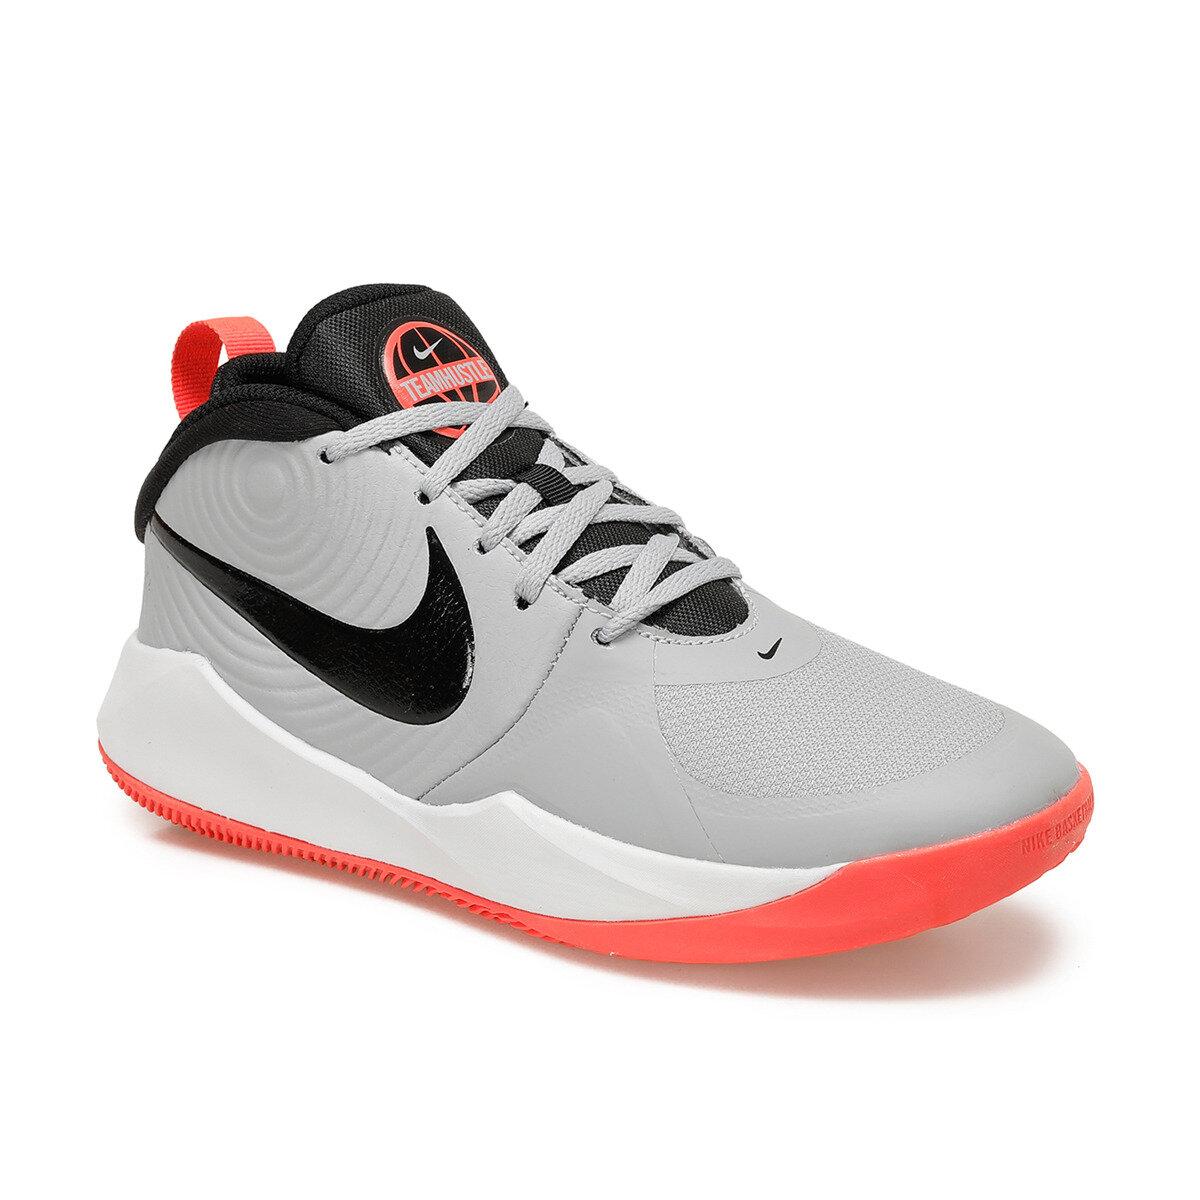 comentarista abrigo Poner a prueba o probar  Nike TEAM HUSTLE D 9 (GS) Gri Erkek Çocuk Basketbol Ayakkabısı 100532493 |  Flo